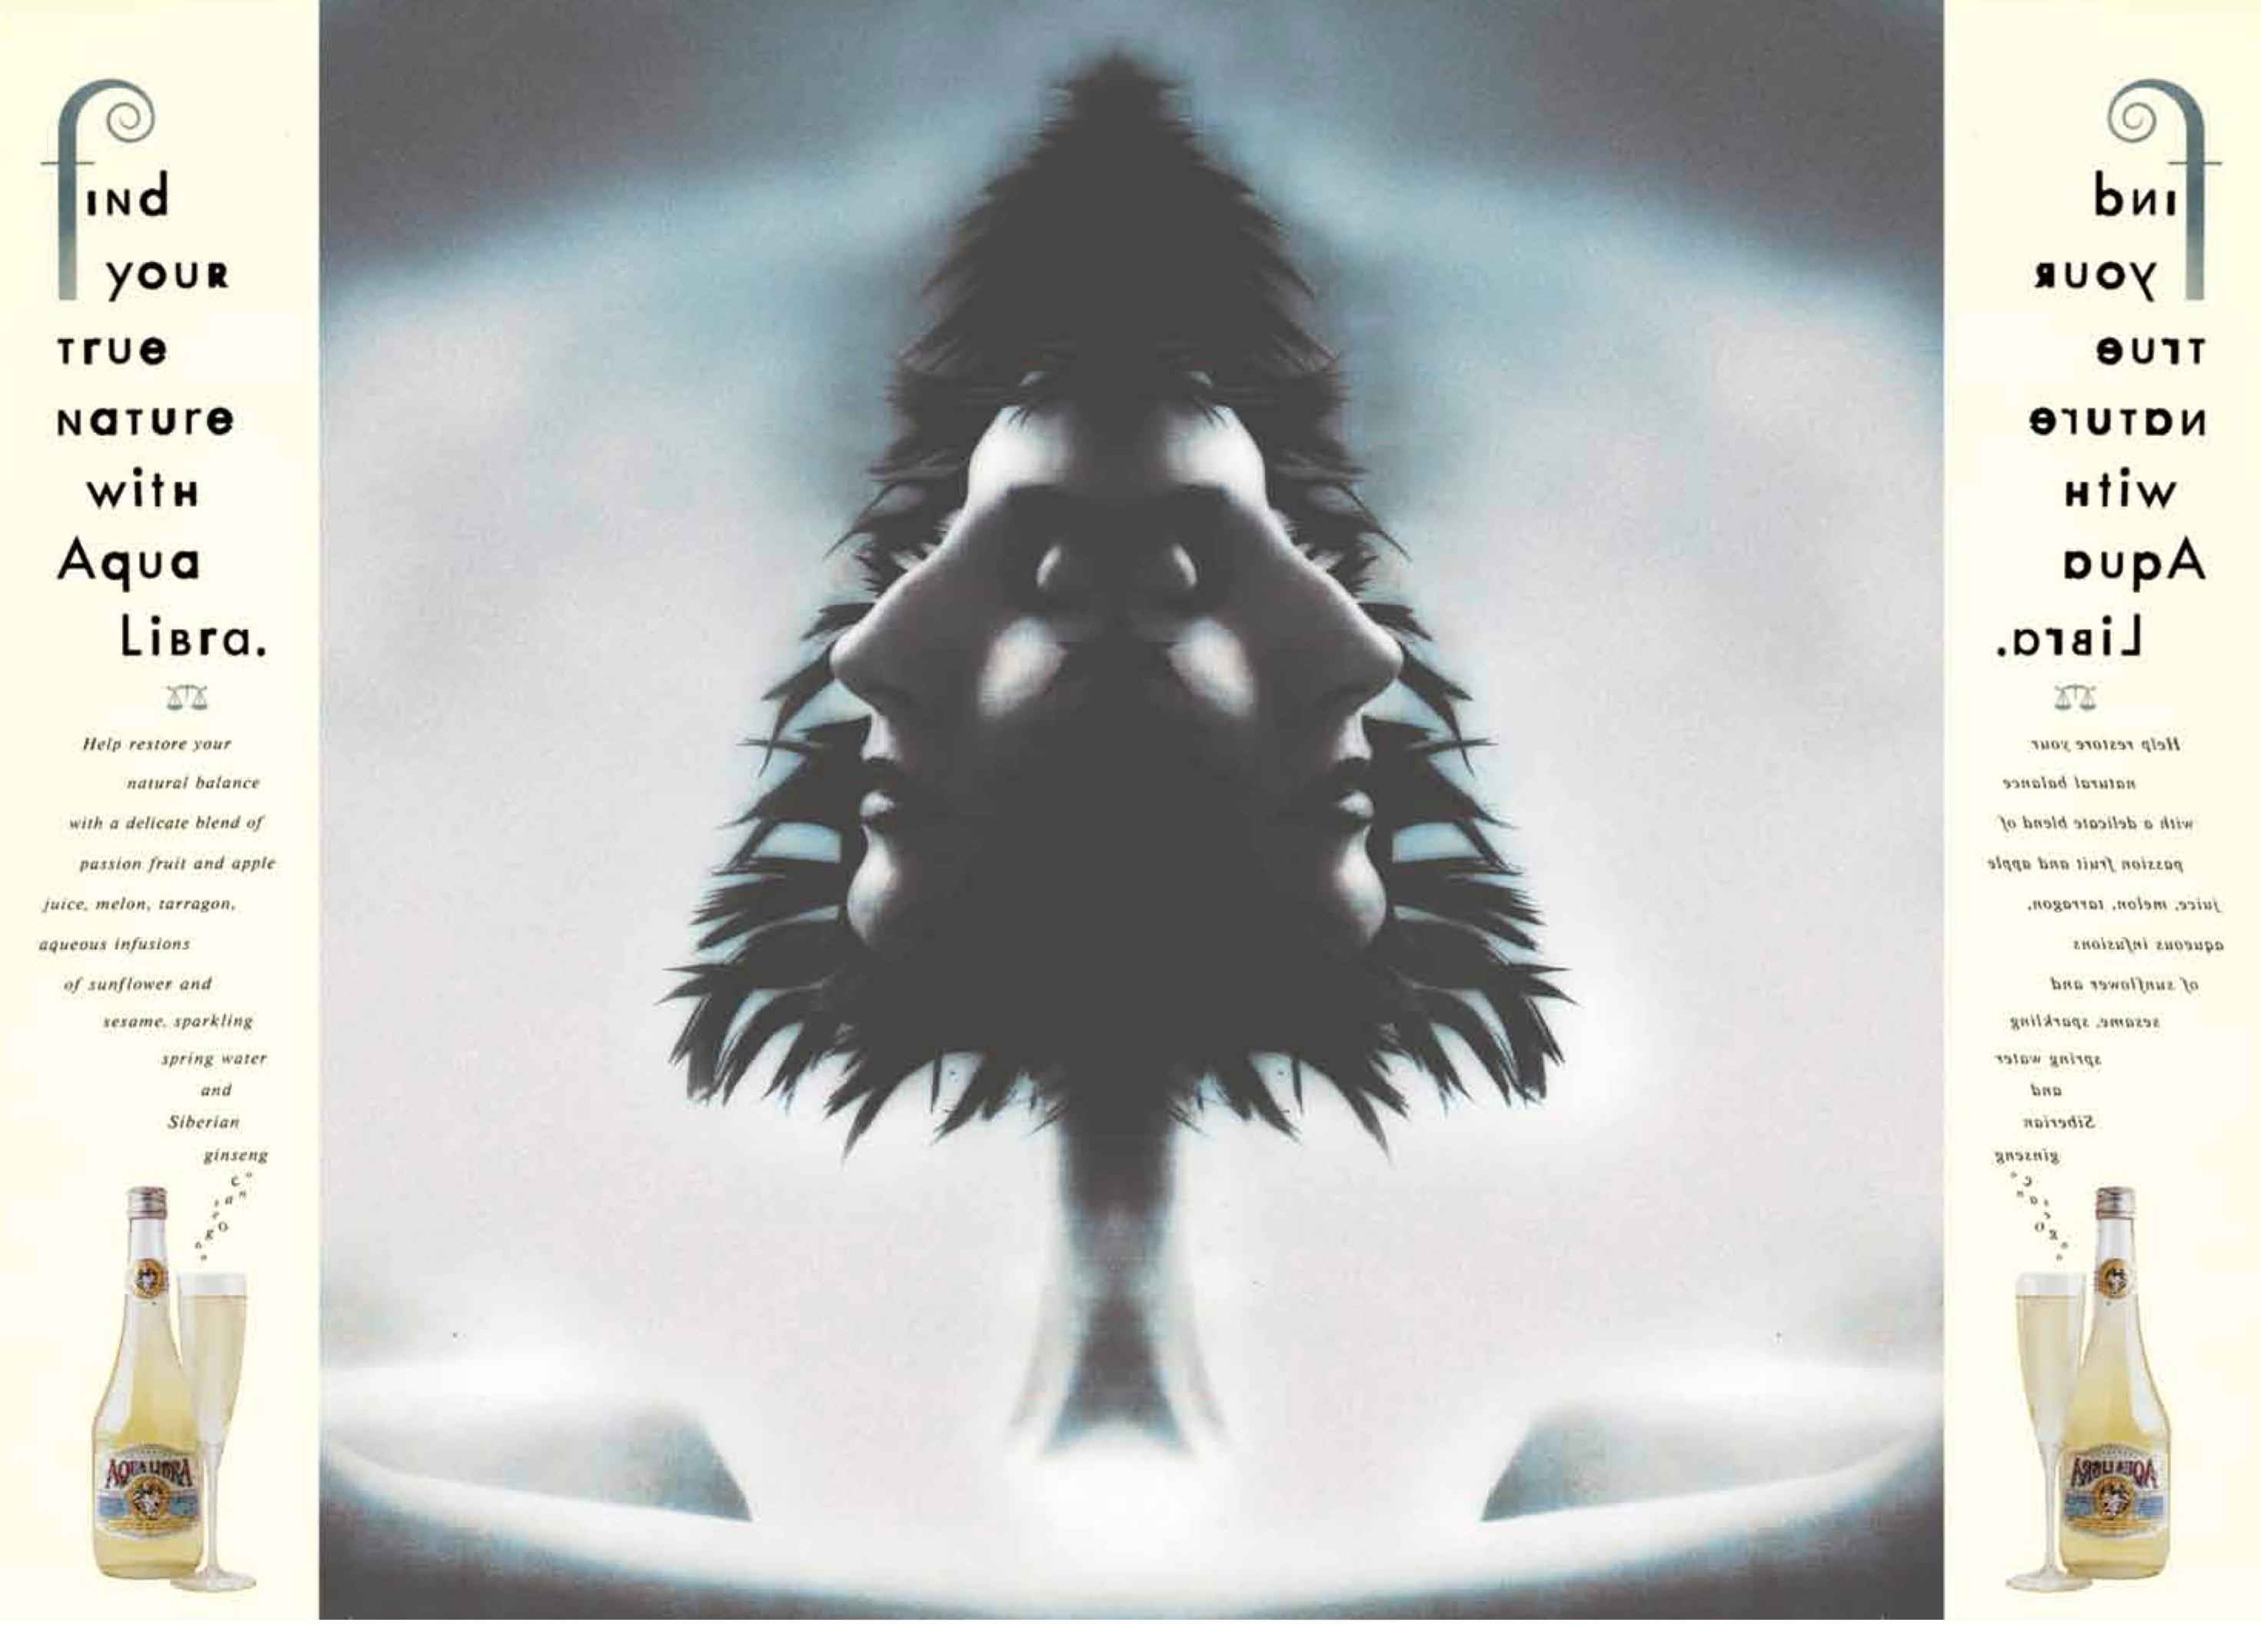 TreeHorns-Aqua-Libra-Mark-Reddy-Ayer-01.jpg